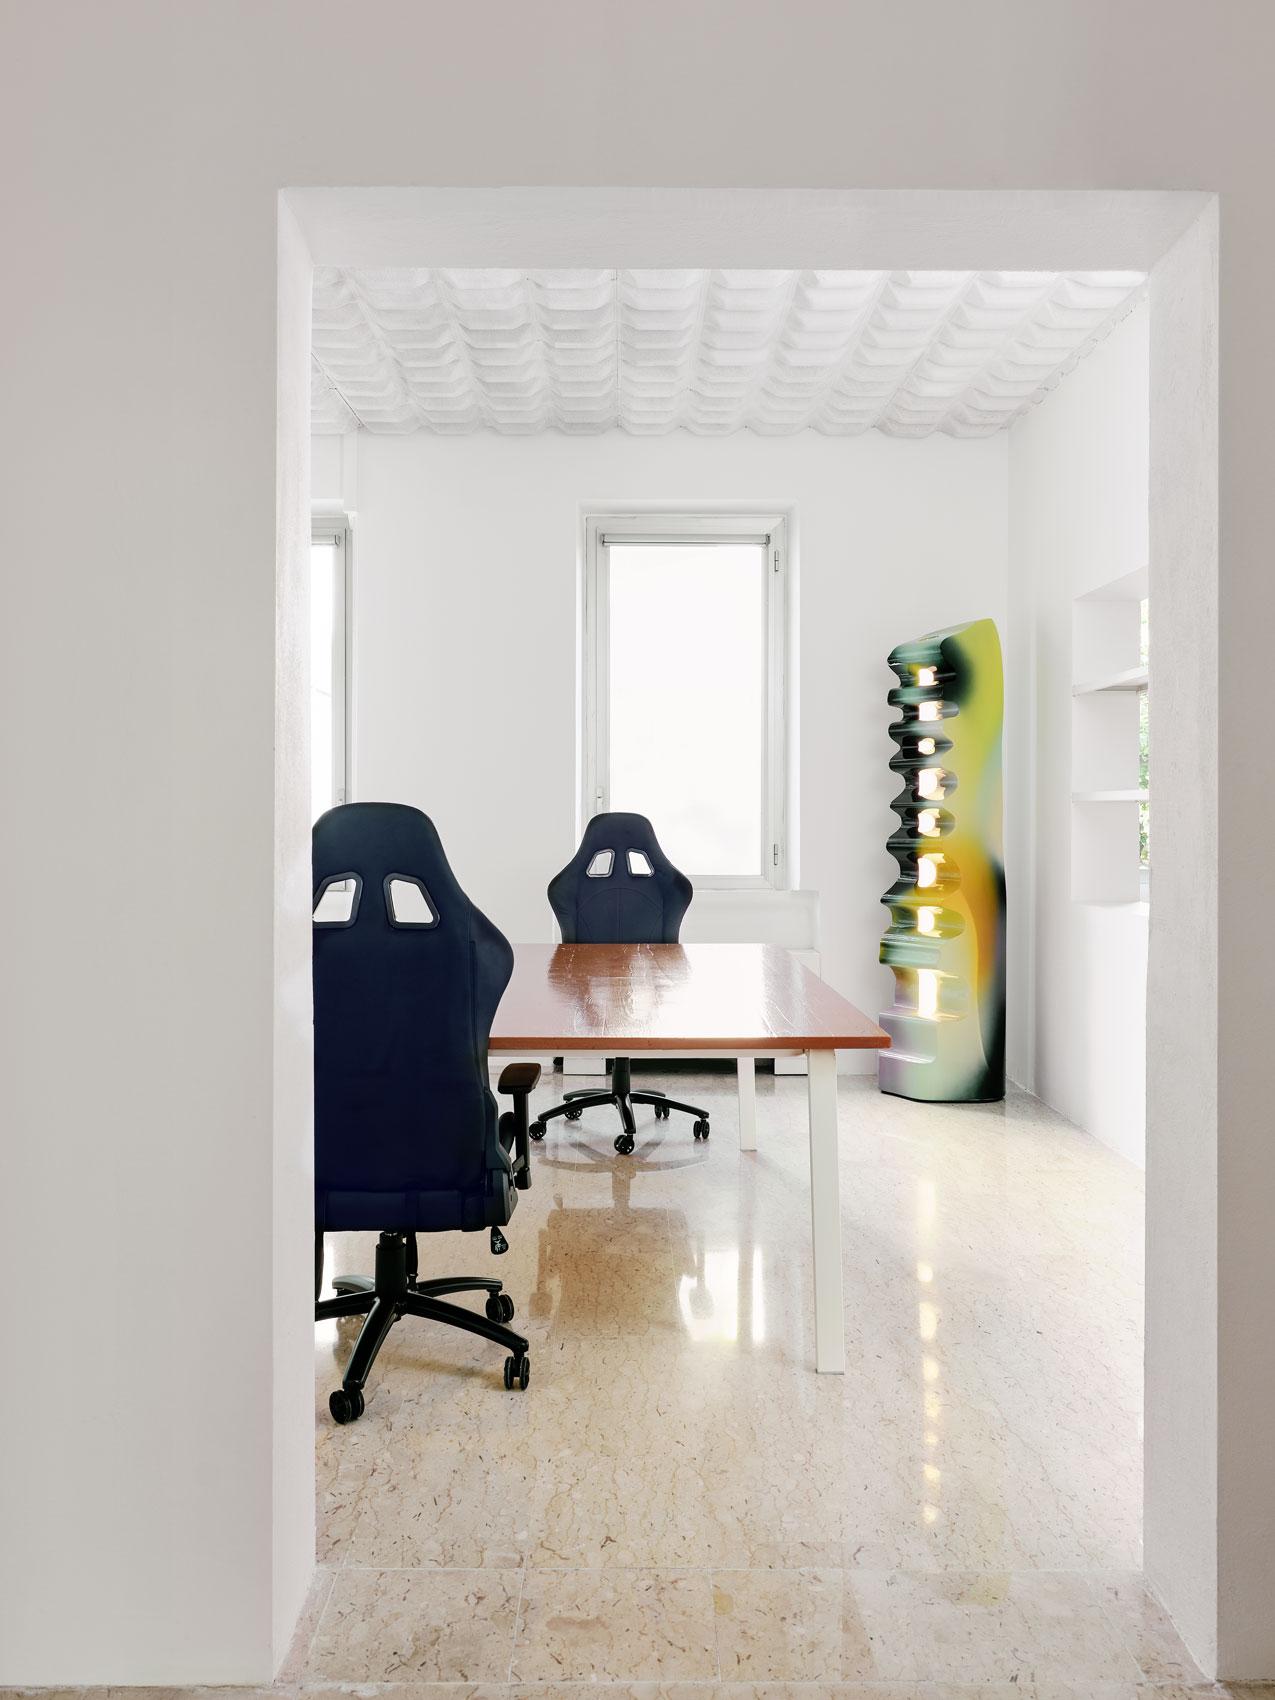 scrivanie di design per showroom uffici stile e brand di moda